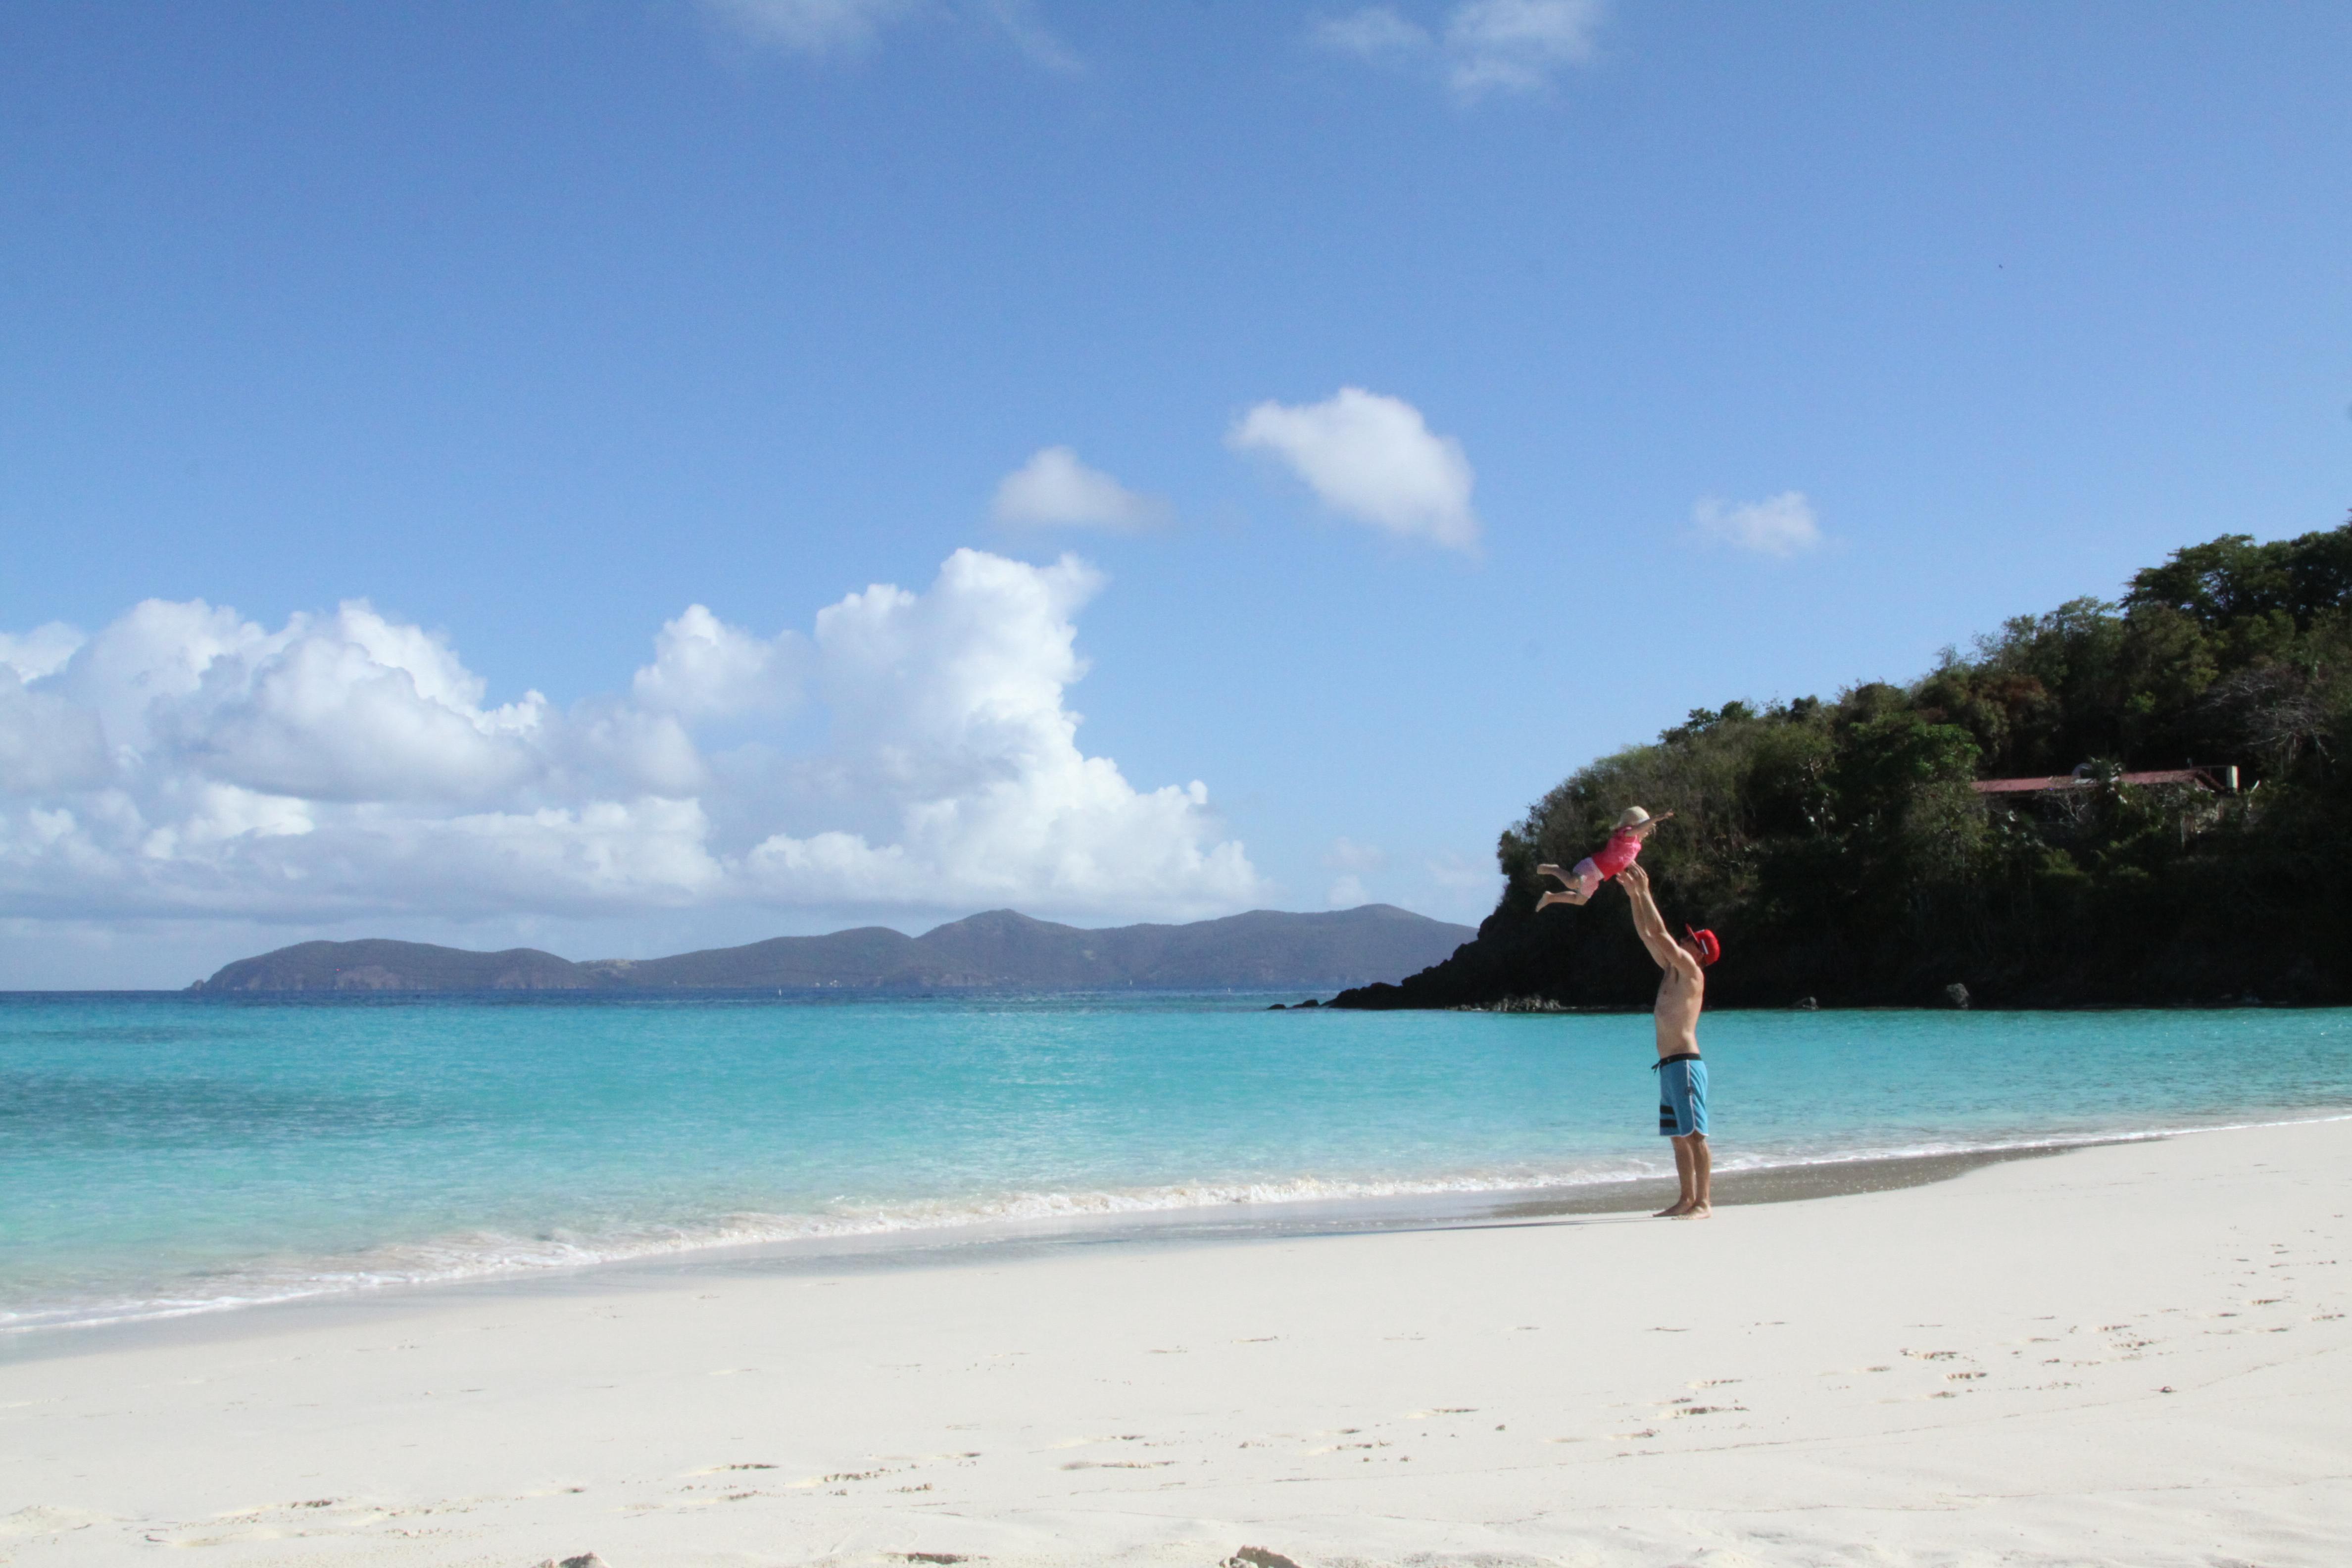 St. John's Caribbean